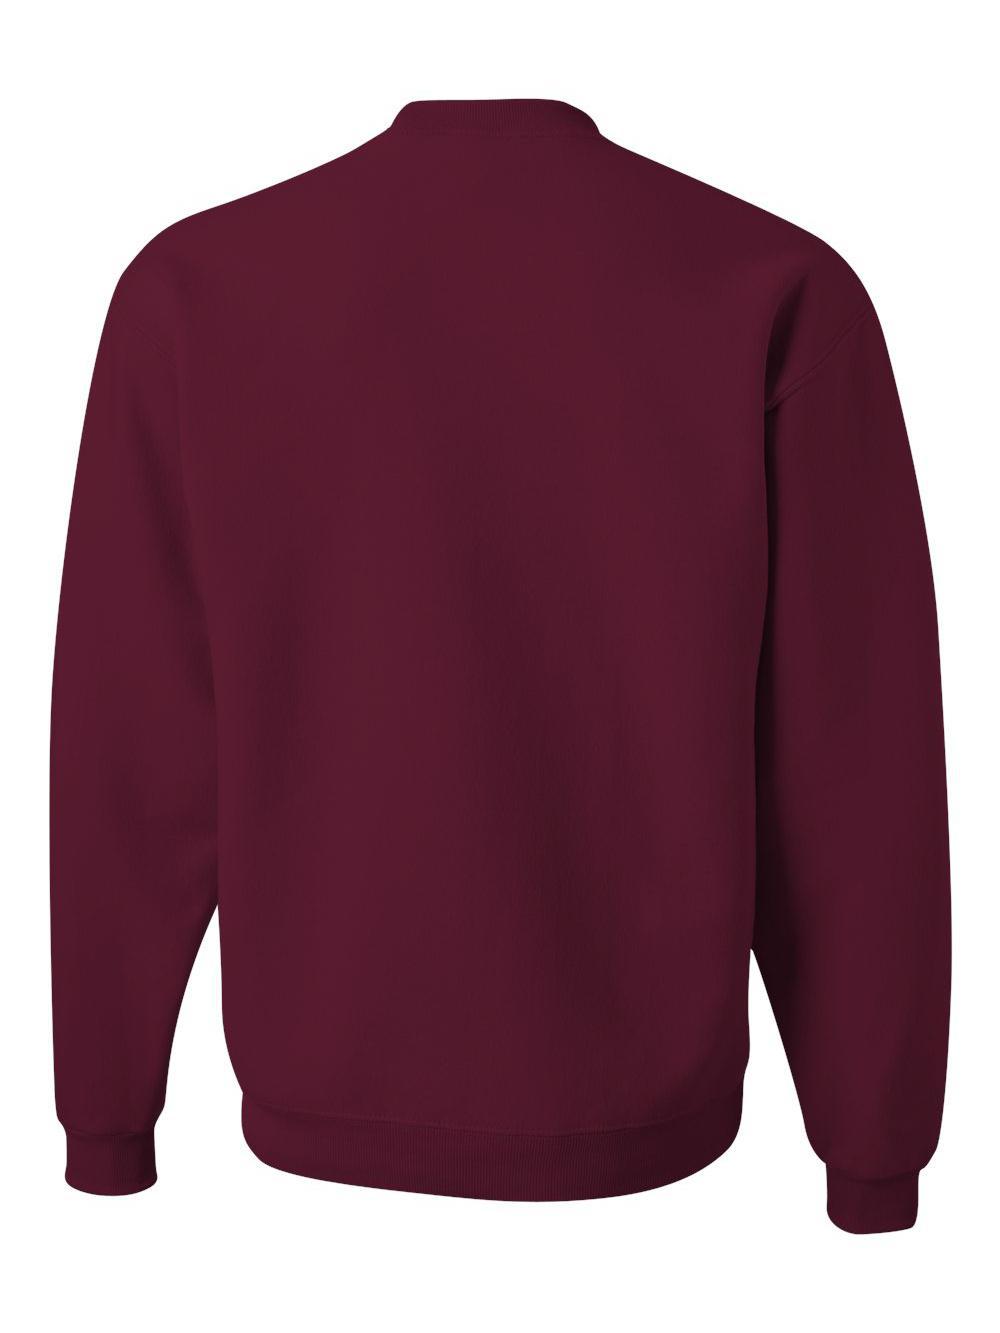 Jerzees-NuBlend-Crewneck-Sweatshirt-562MR thumbnail 58